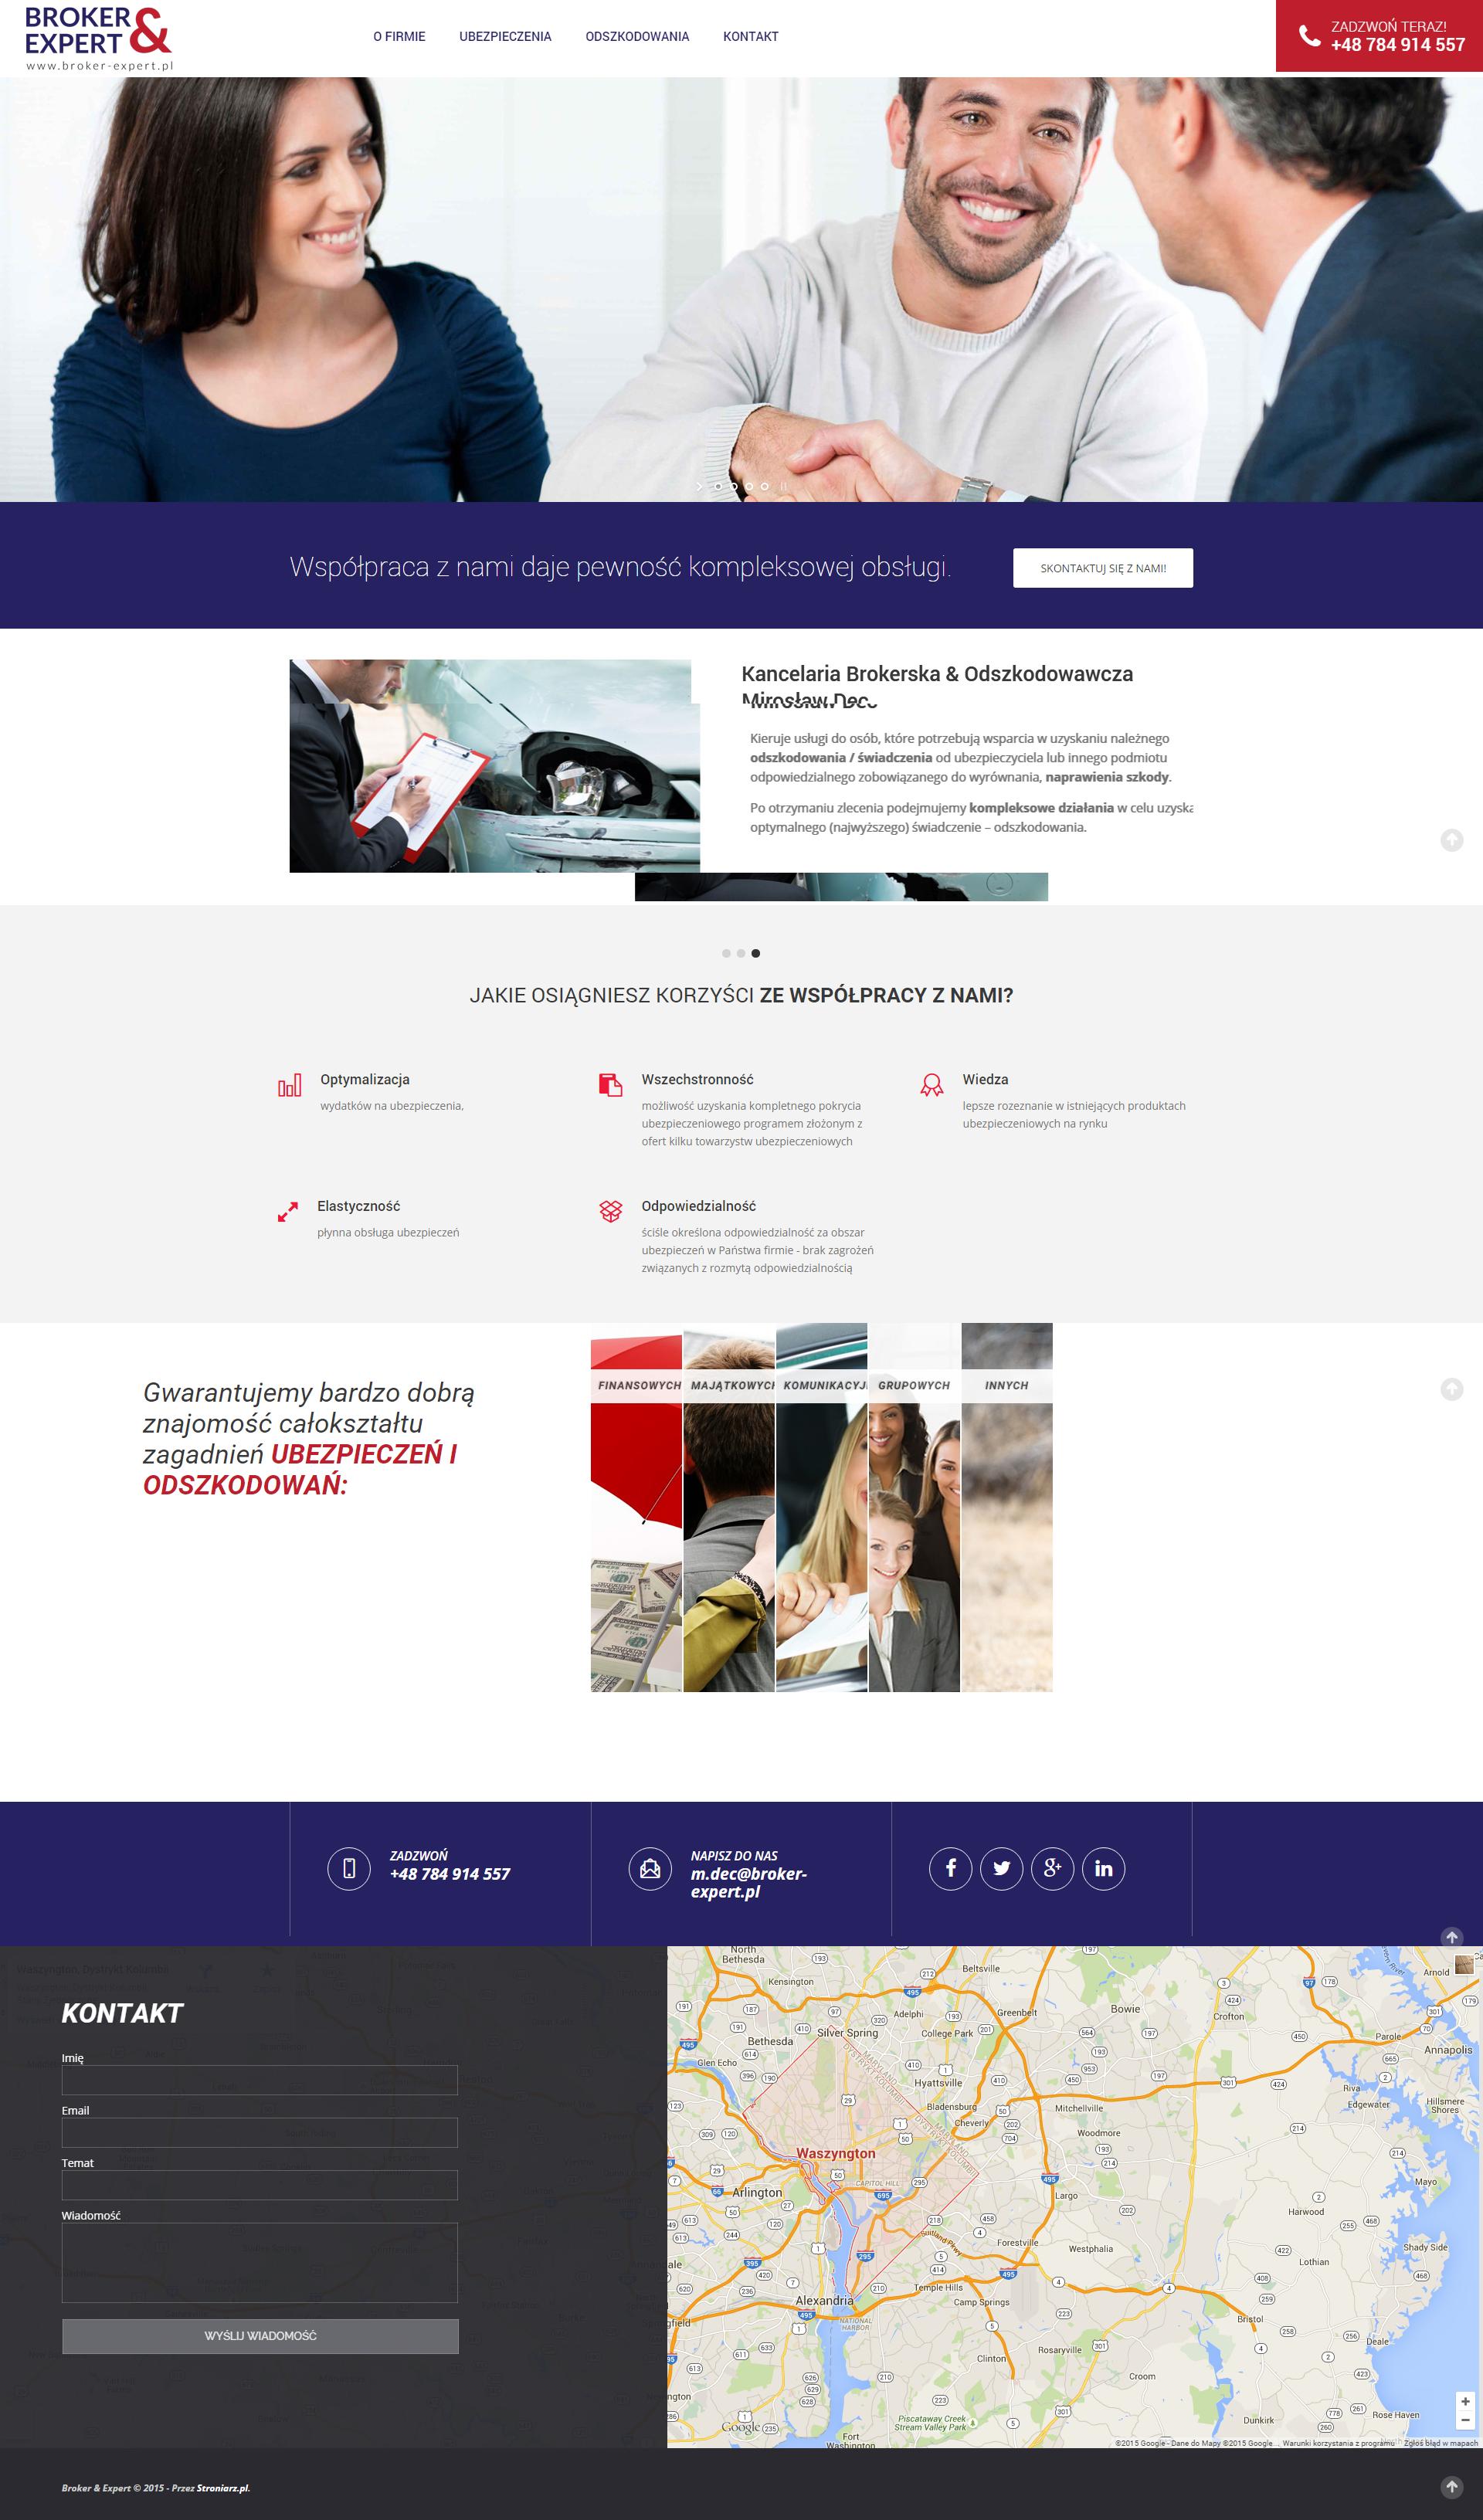 screencapture-broker-expert-pl-1438930384361